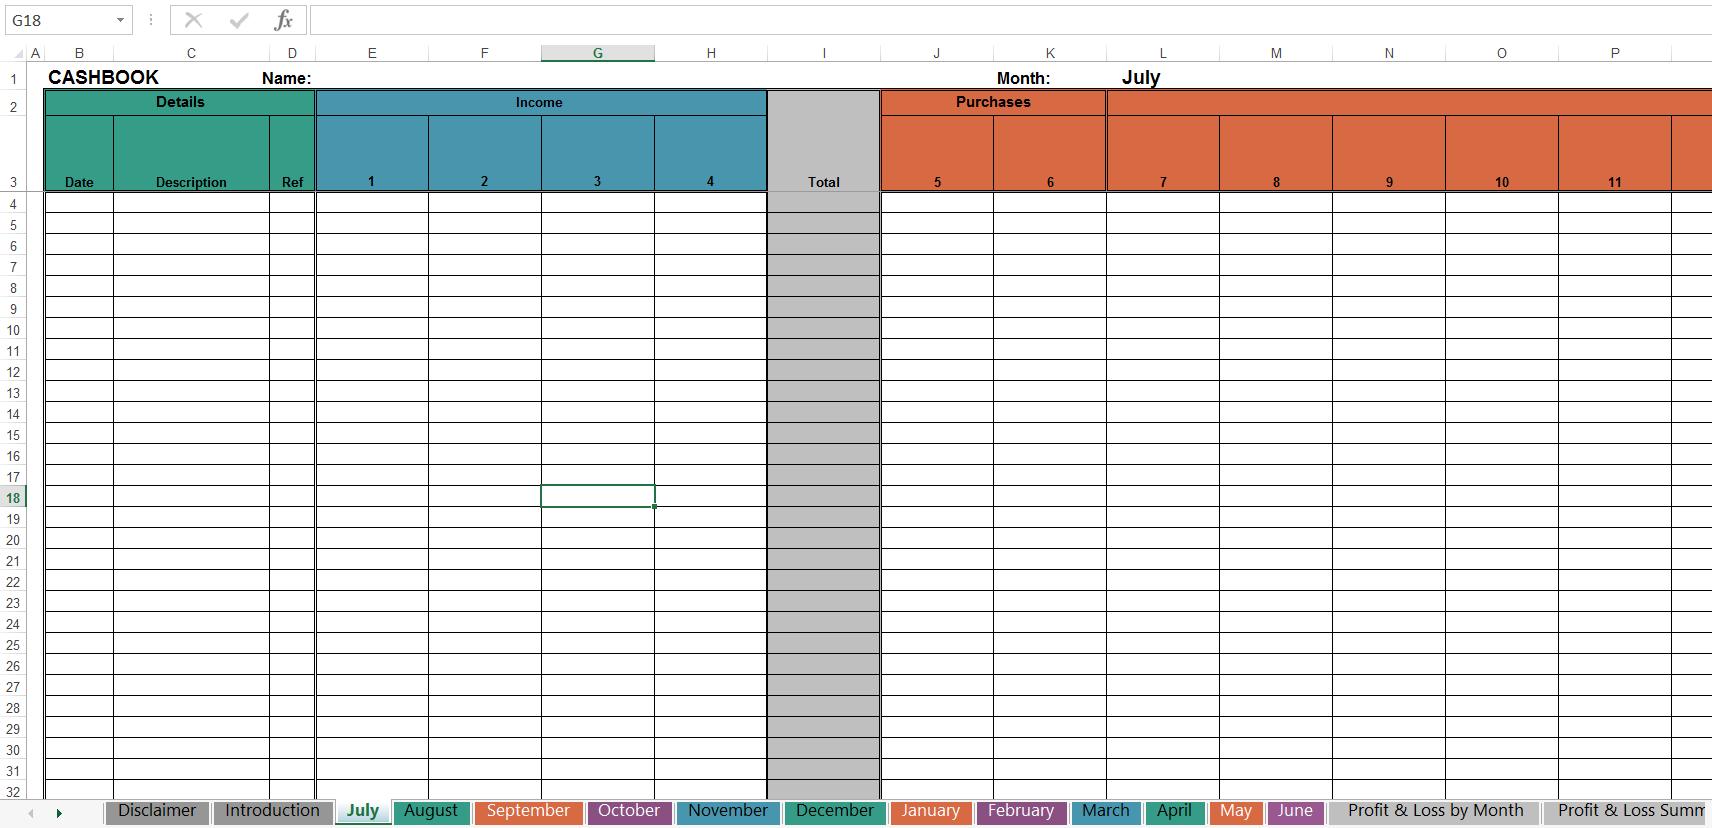 Tax Spreadsheet Templates Australia Inside Free Cashbook Online Tax Solutions